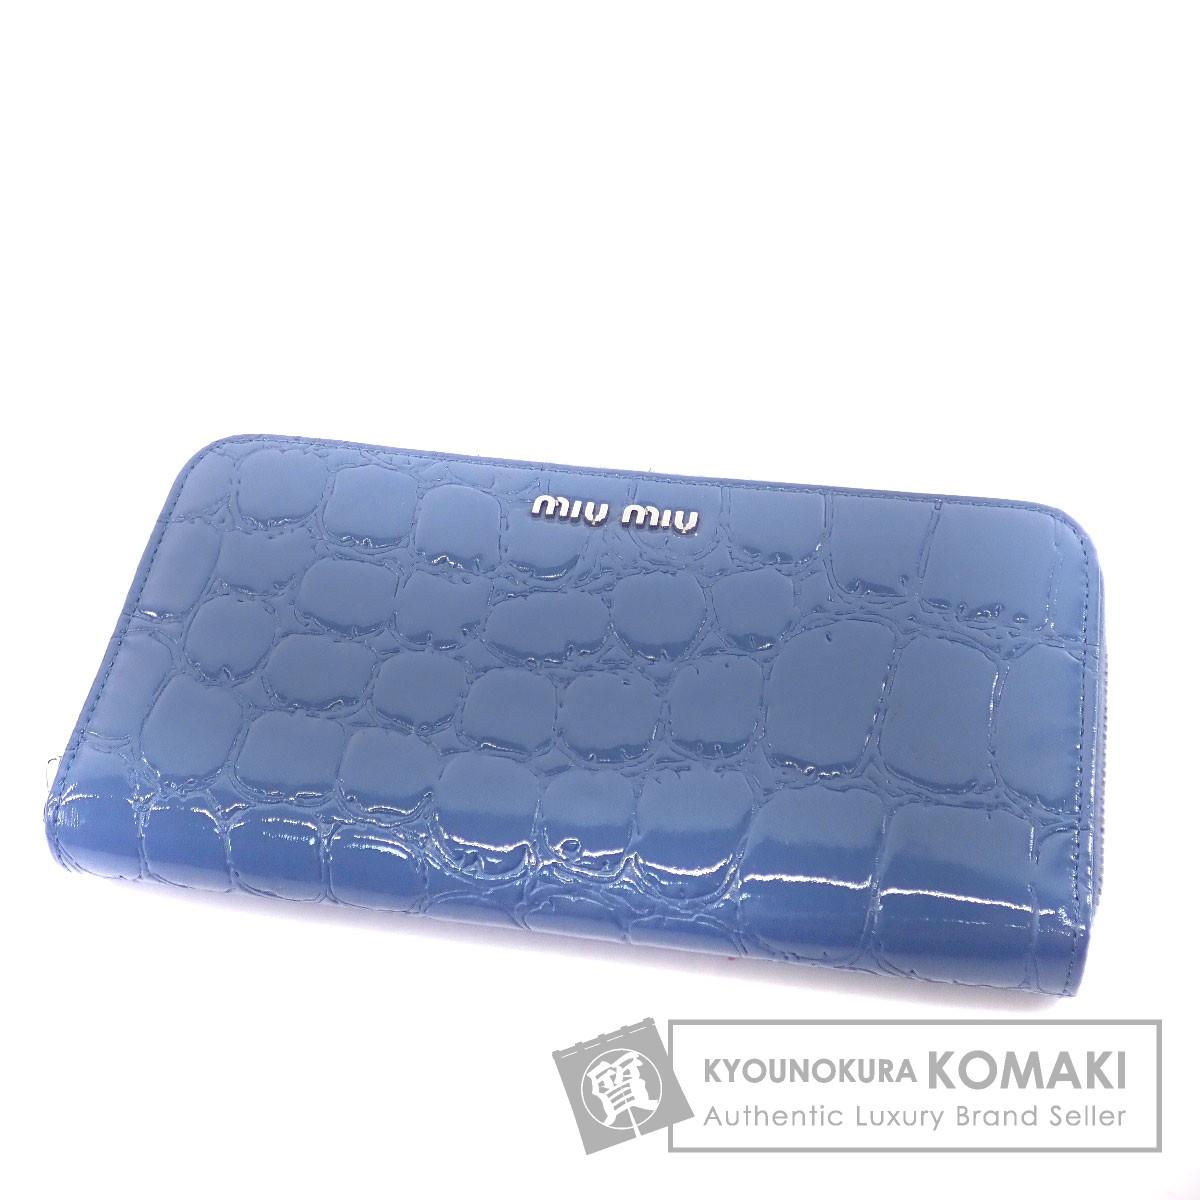 MIUMIU ロゴマーク 長財布(小銭入れあり) パテントレザー レディース 【中古】【ミュウミュウ】